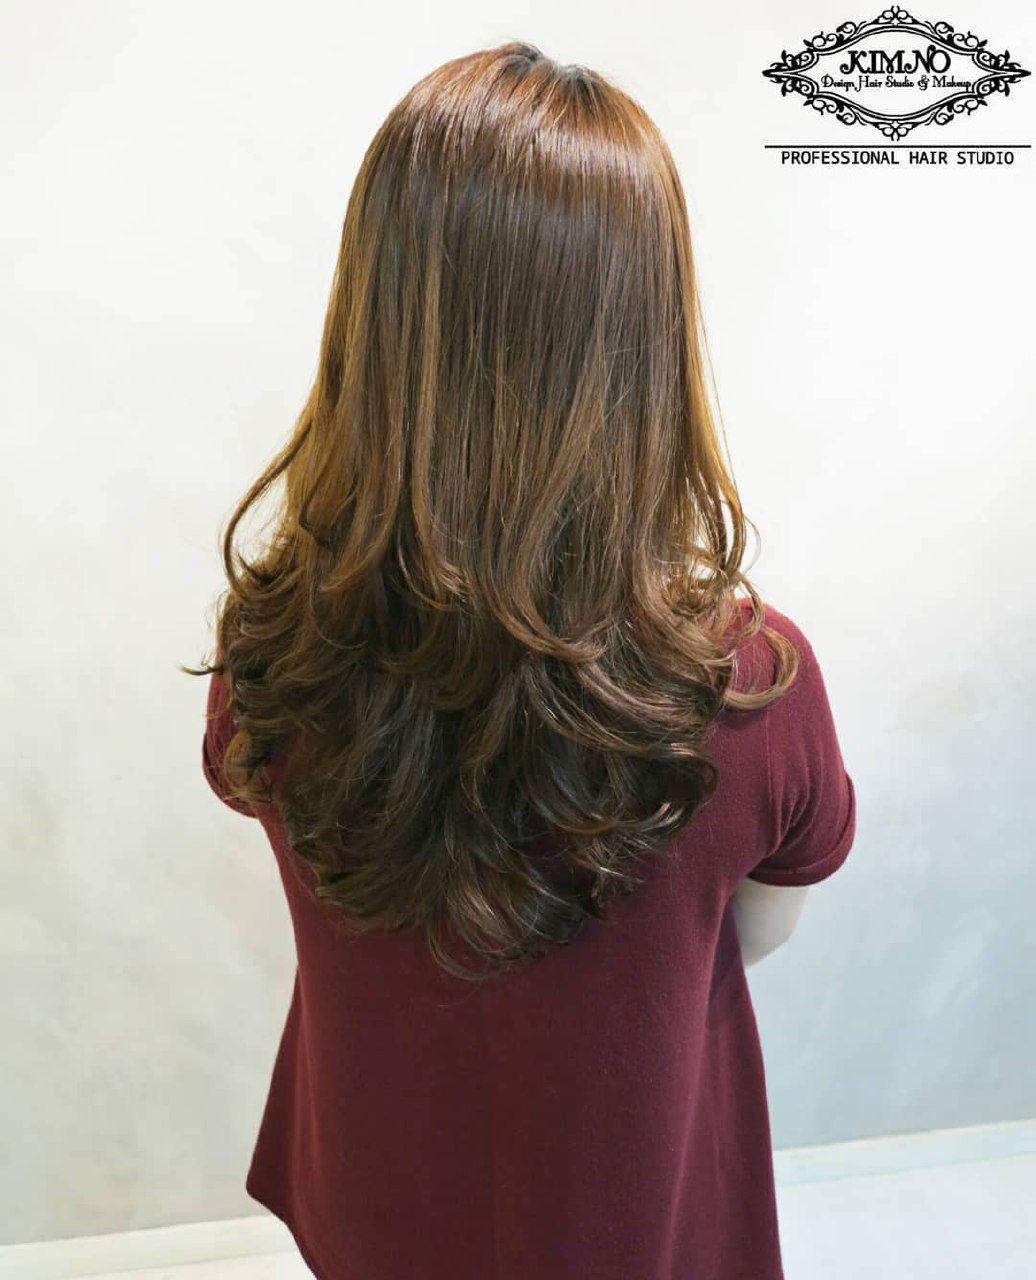 kimno design hair studio and makeup